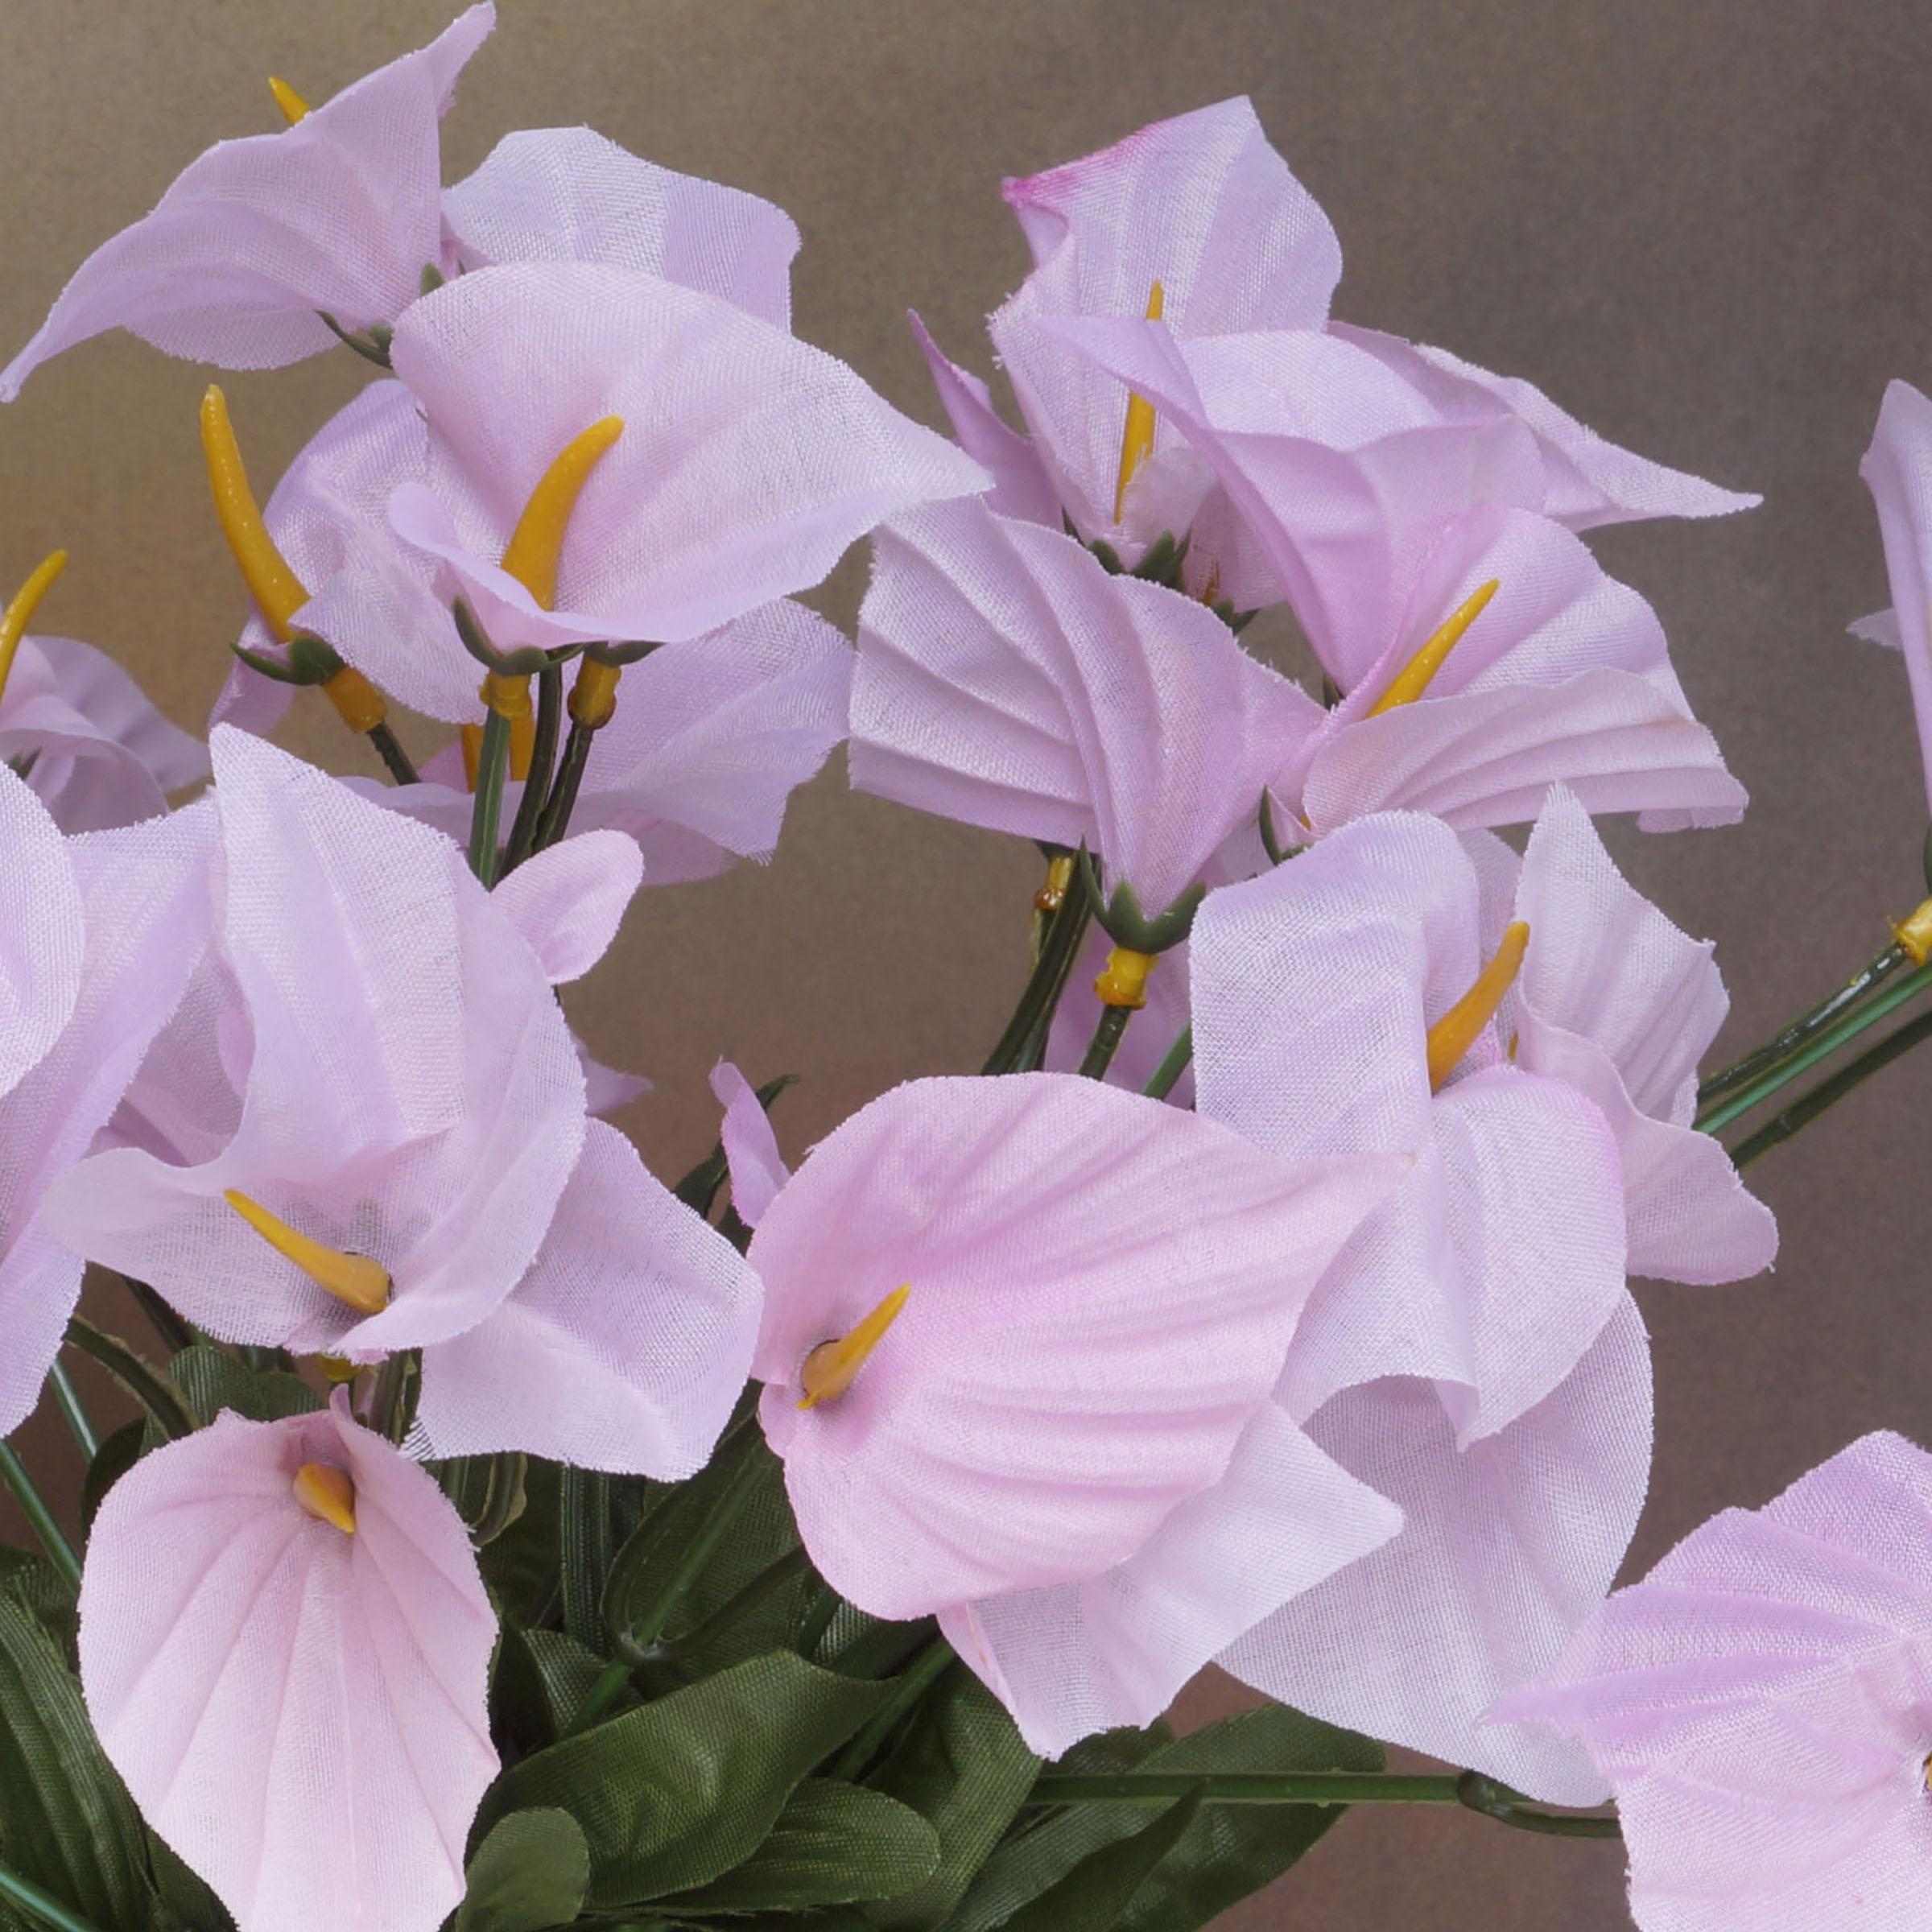 504 MINI Silk CALLA Lilies Flowers for Wedding Bouquets Centerpieces ...